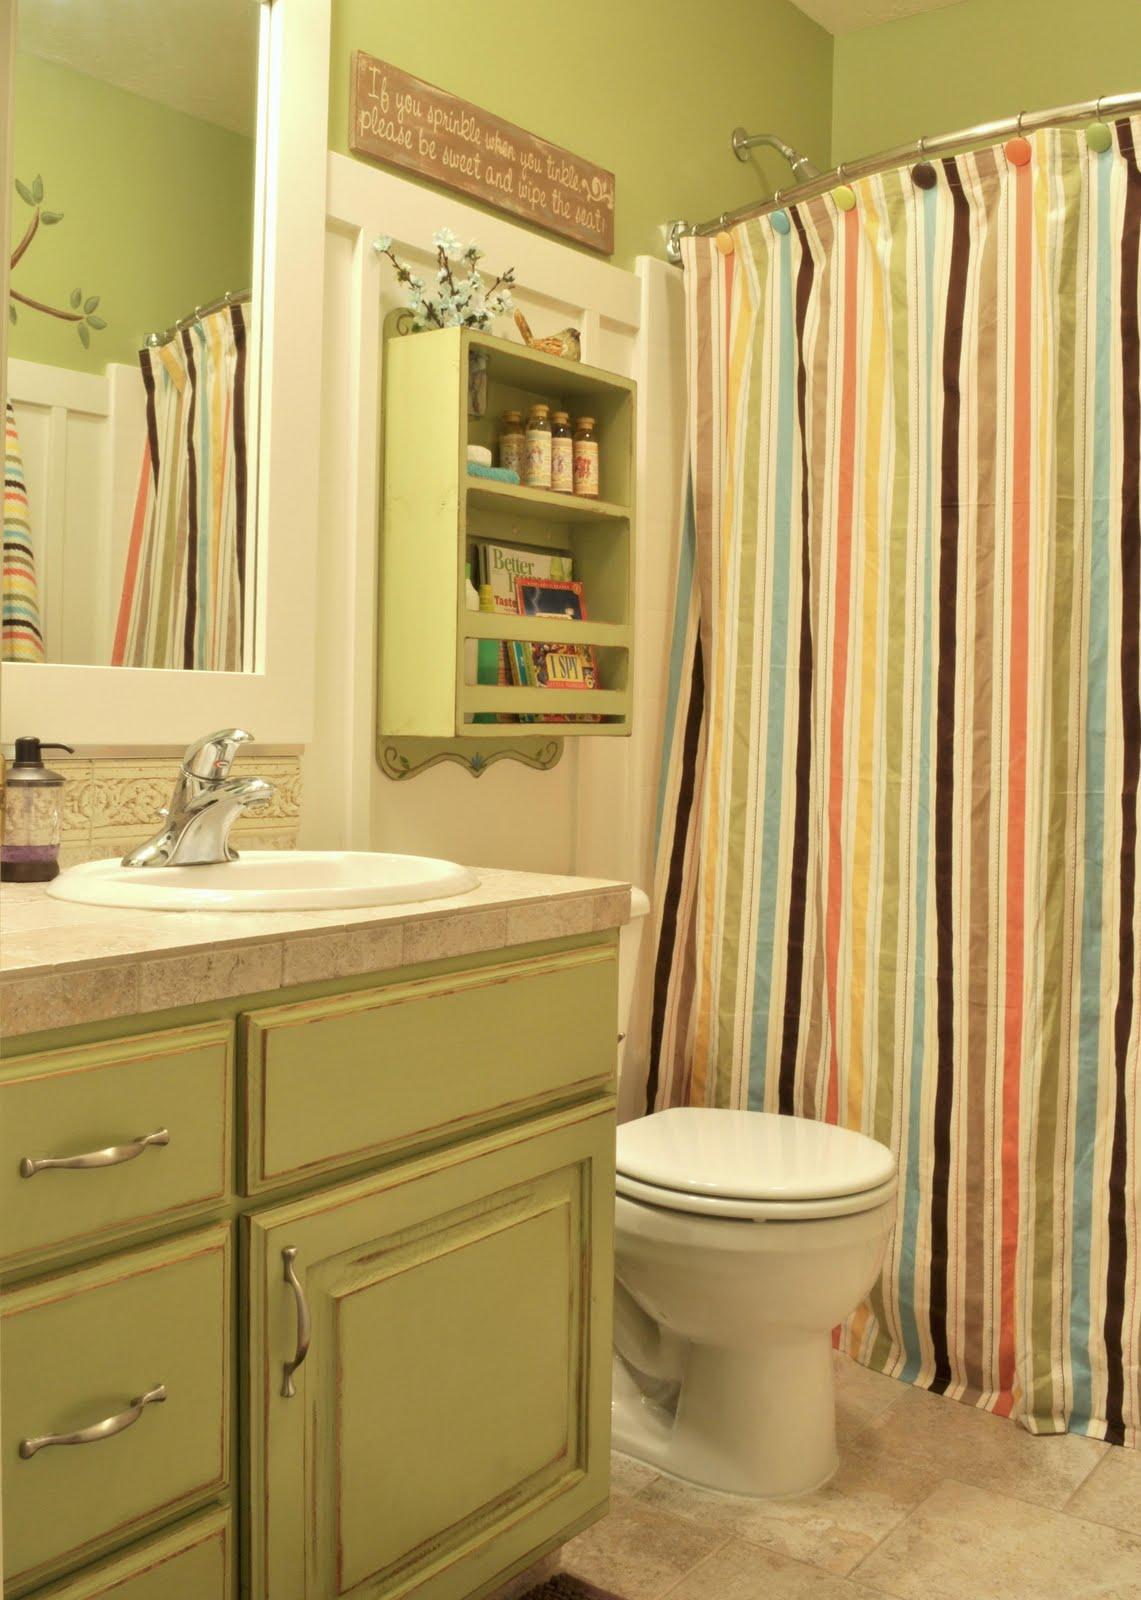 Sassy Sanctuary: The Bathroom Is Done!